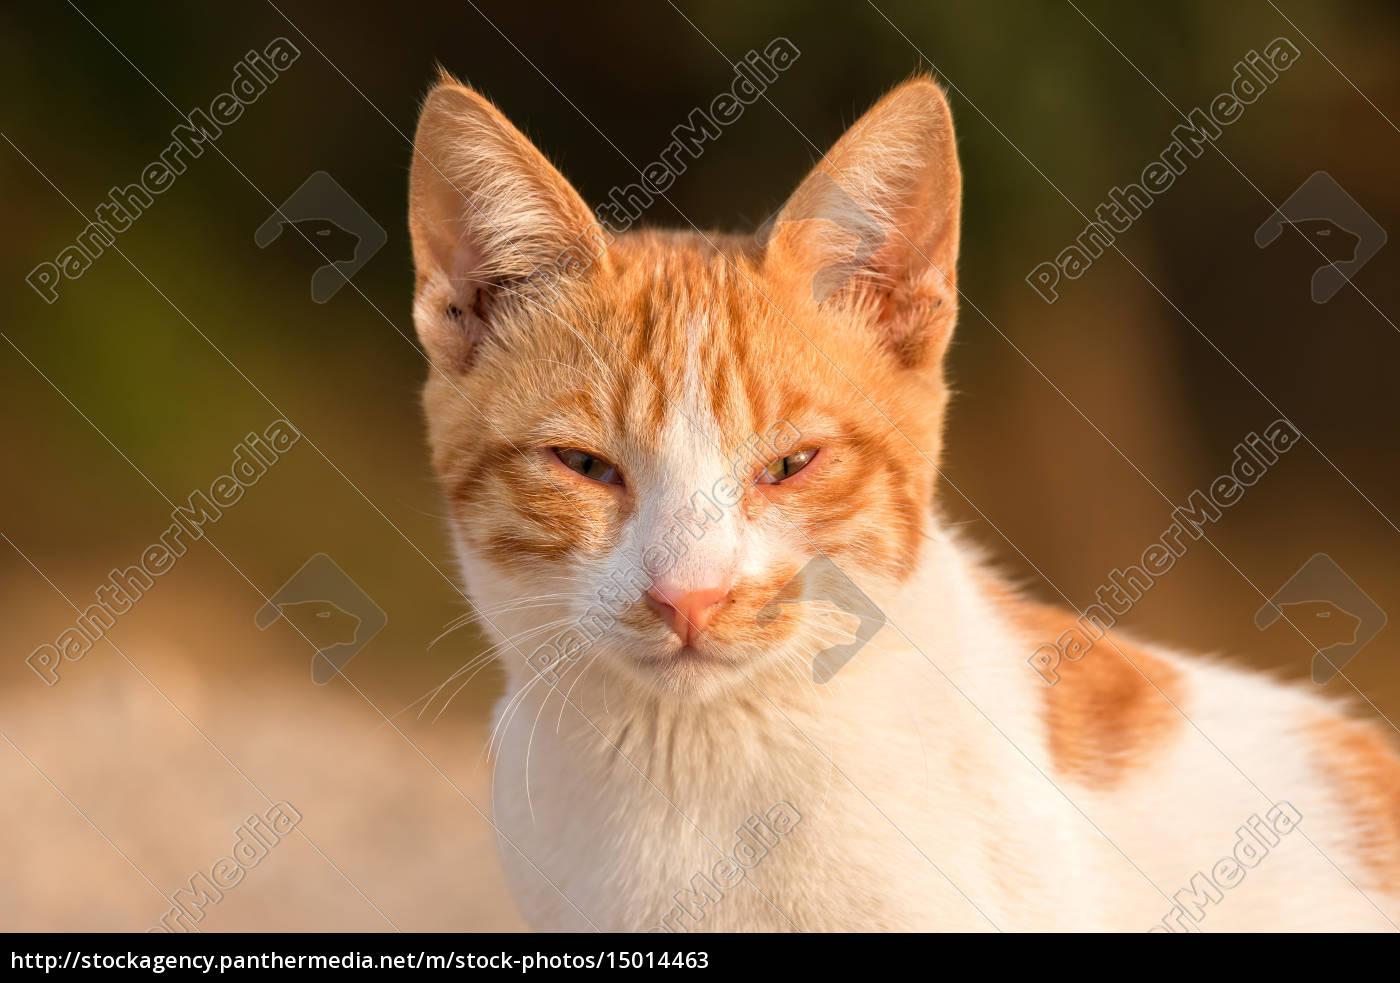 red, cat, portrait - 15014463